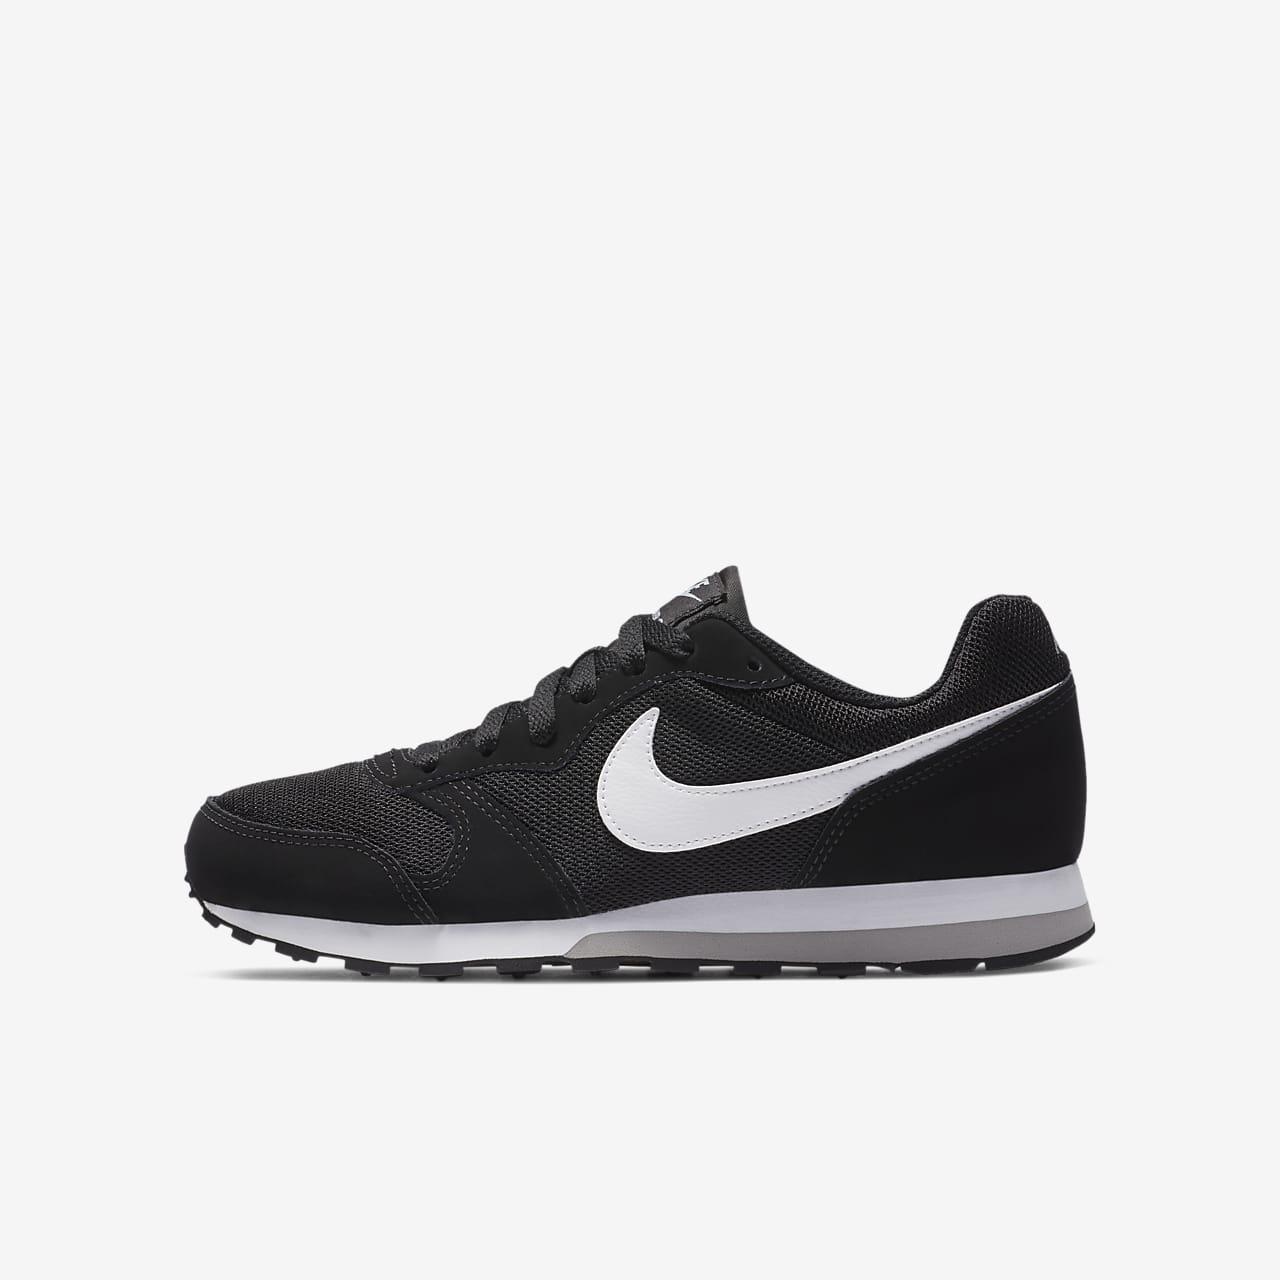 scarpe nike 37.5 ragazzo